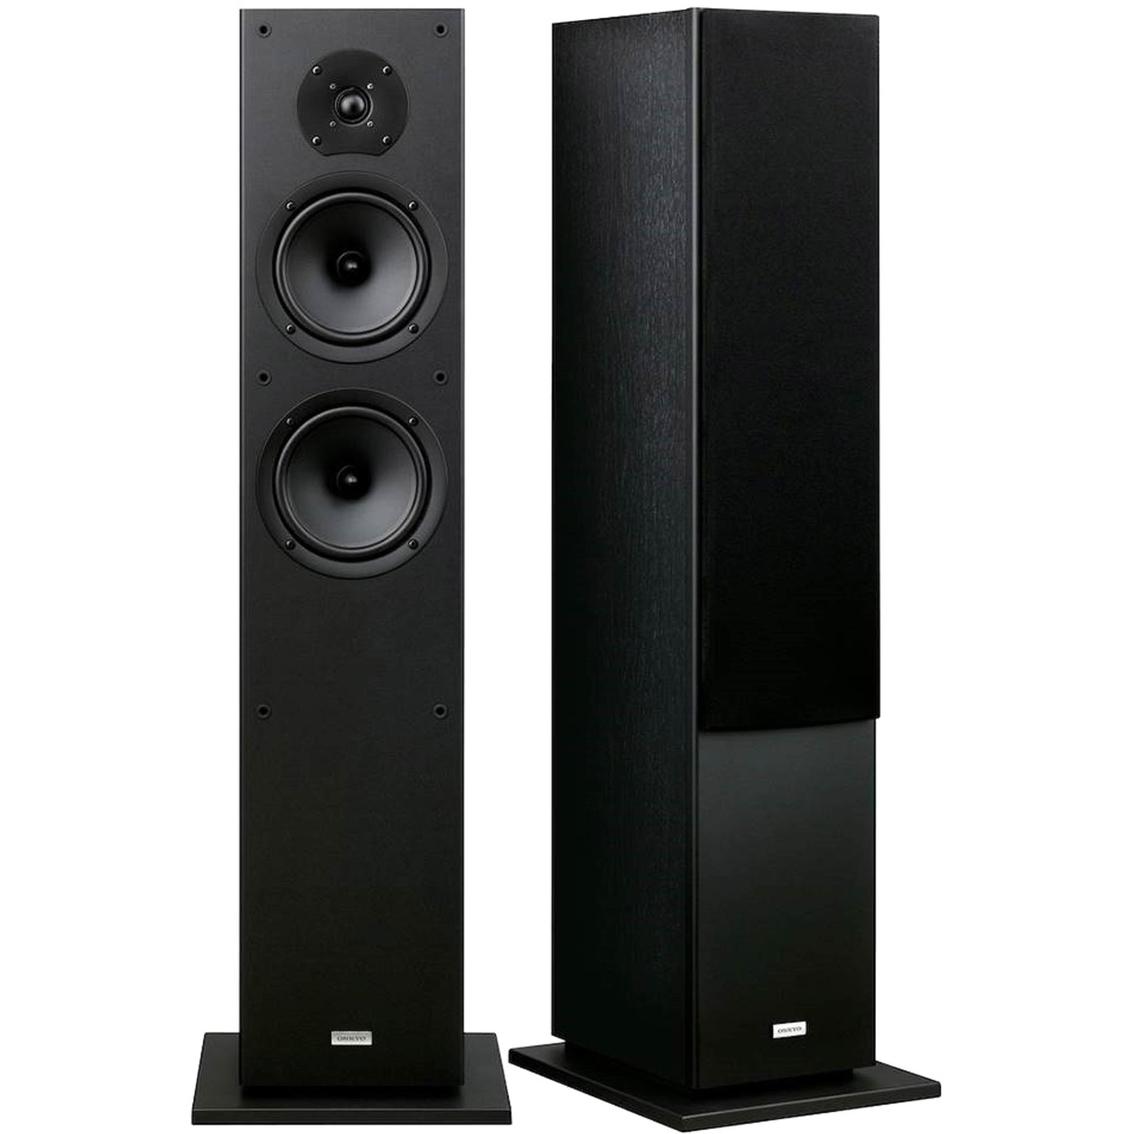 onkyo 130w 2 way bass reflex front speakers pair floor. Black Bedroom Furniture Sets. Home Design Ideas